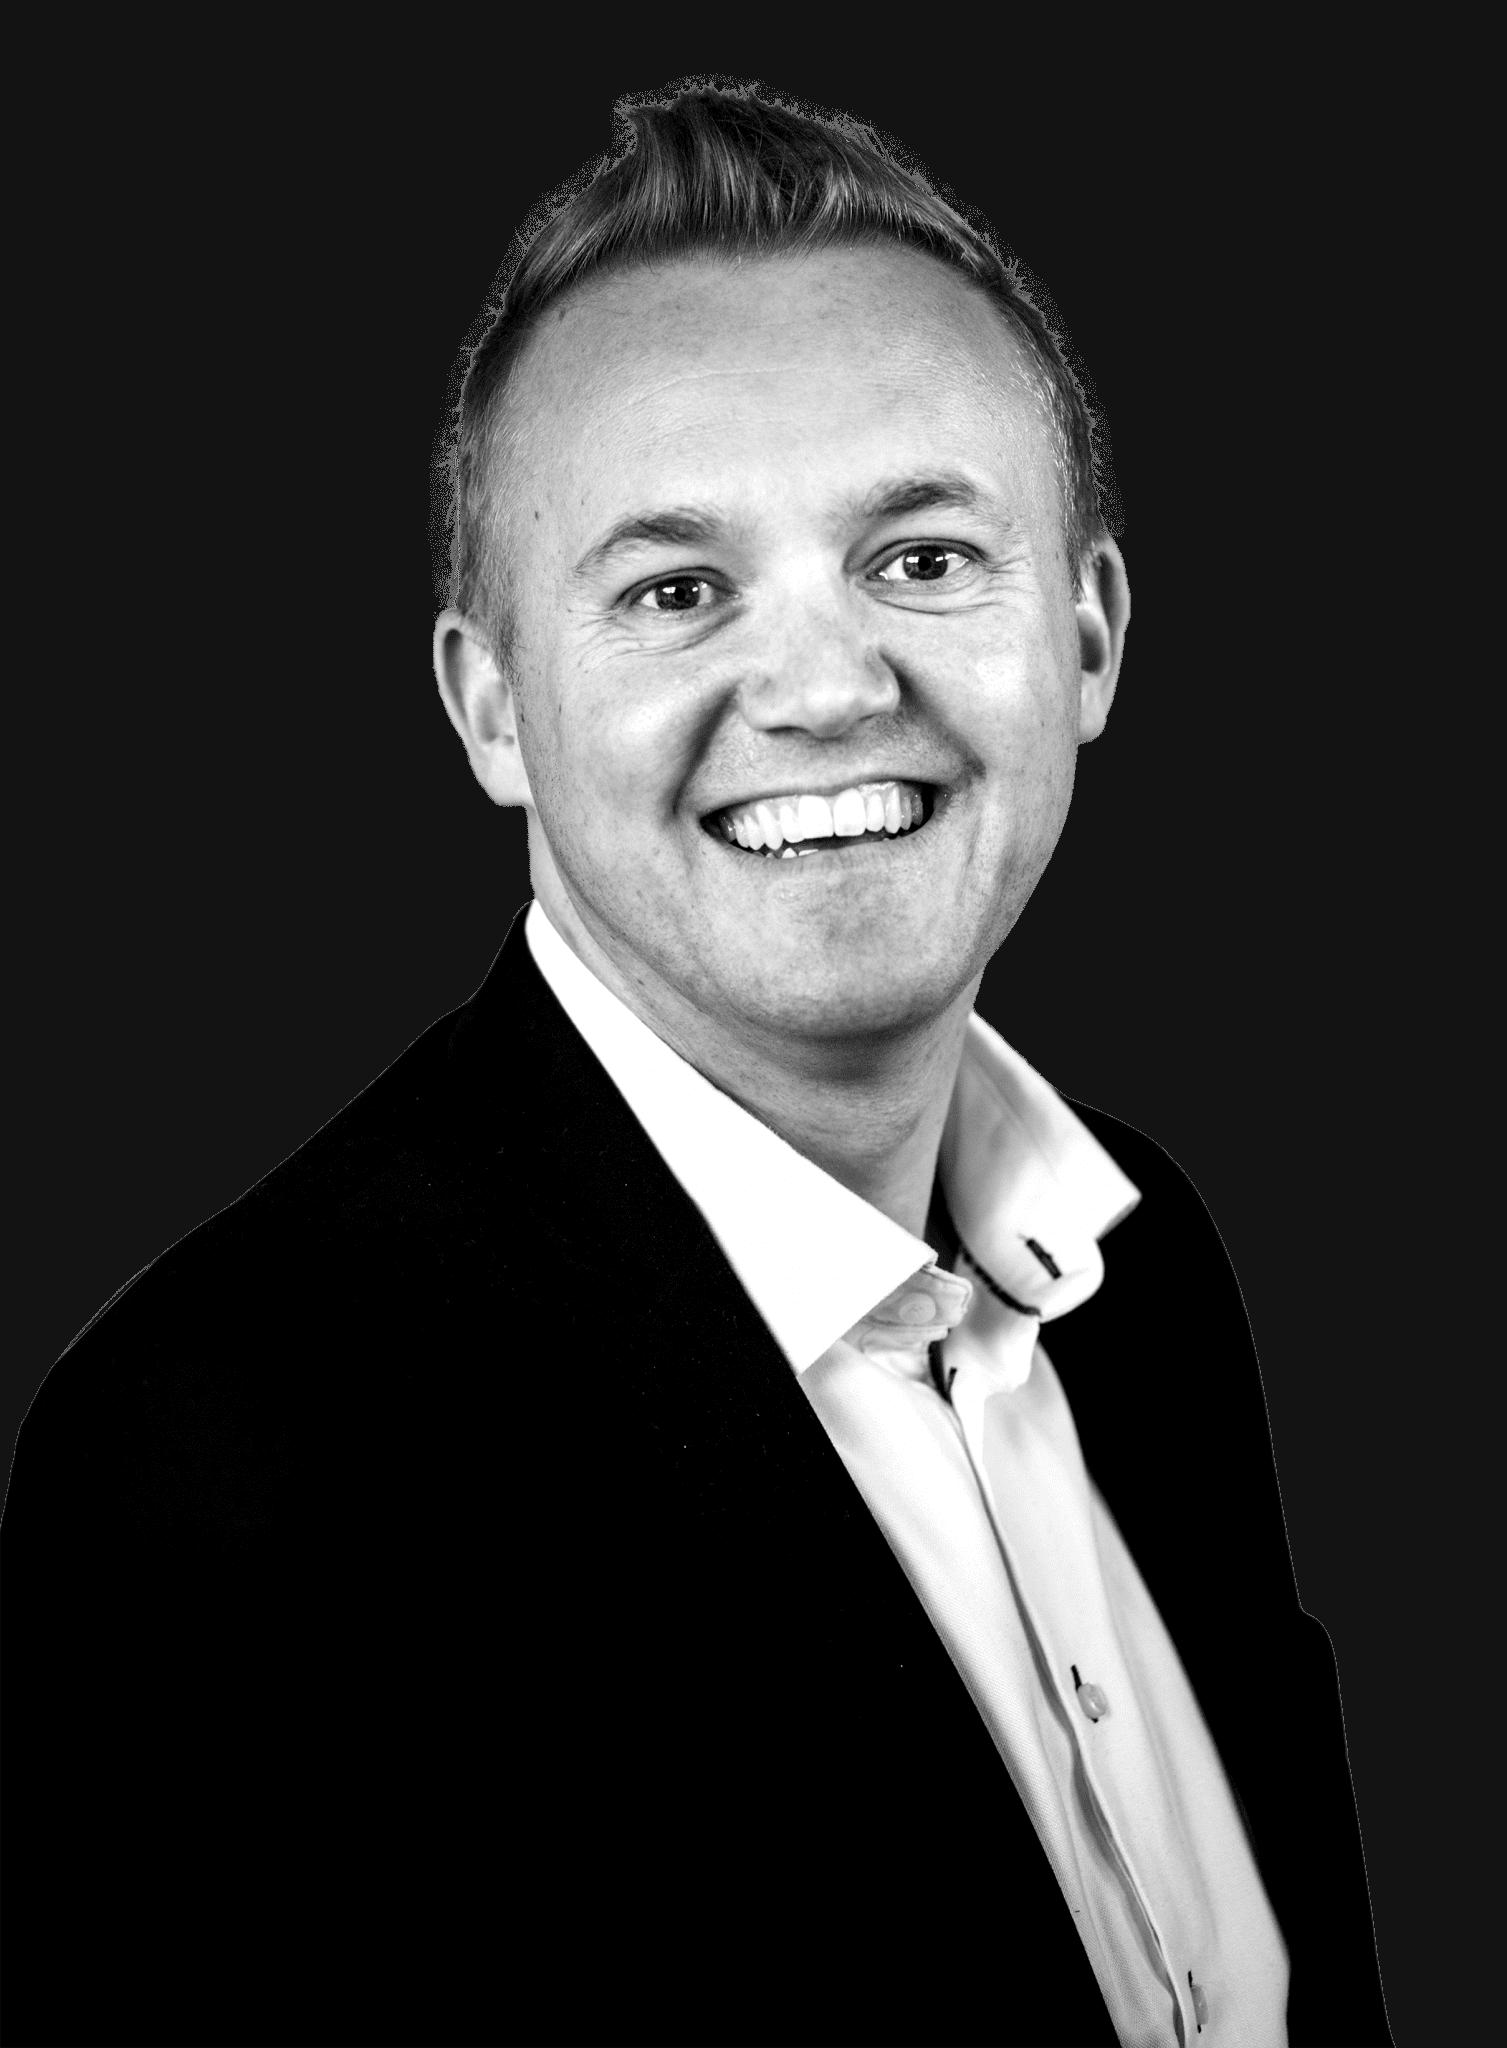 Jacob Lie-Olsen Kildebogaard